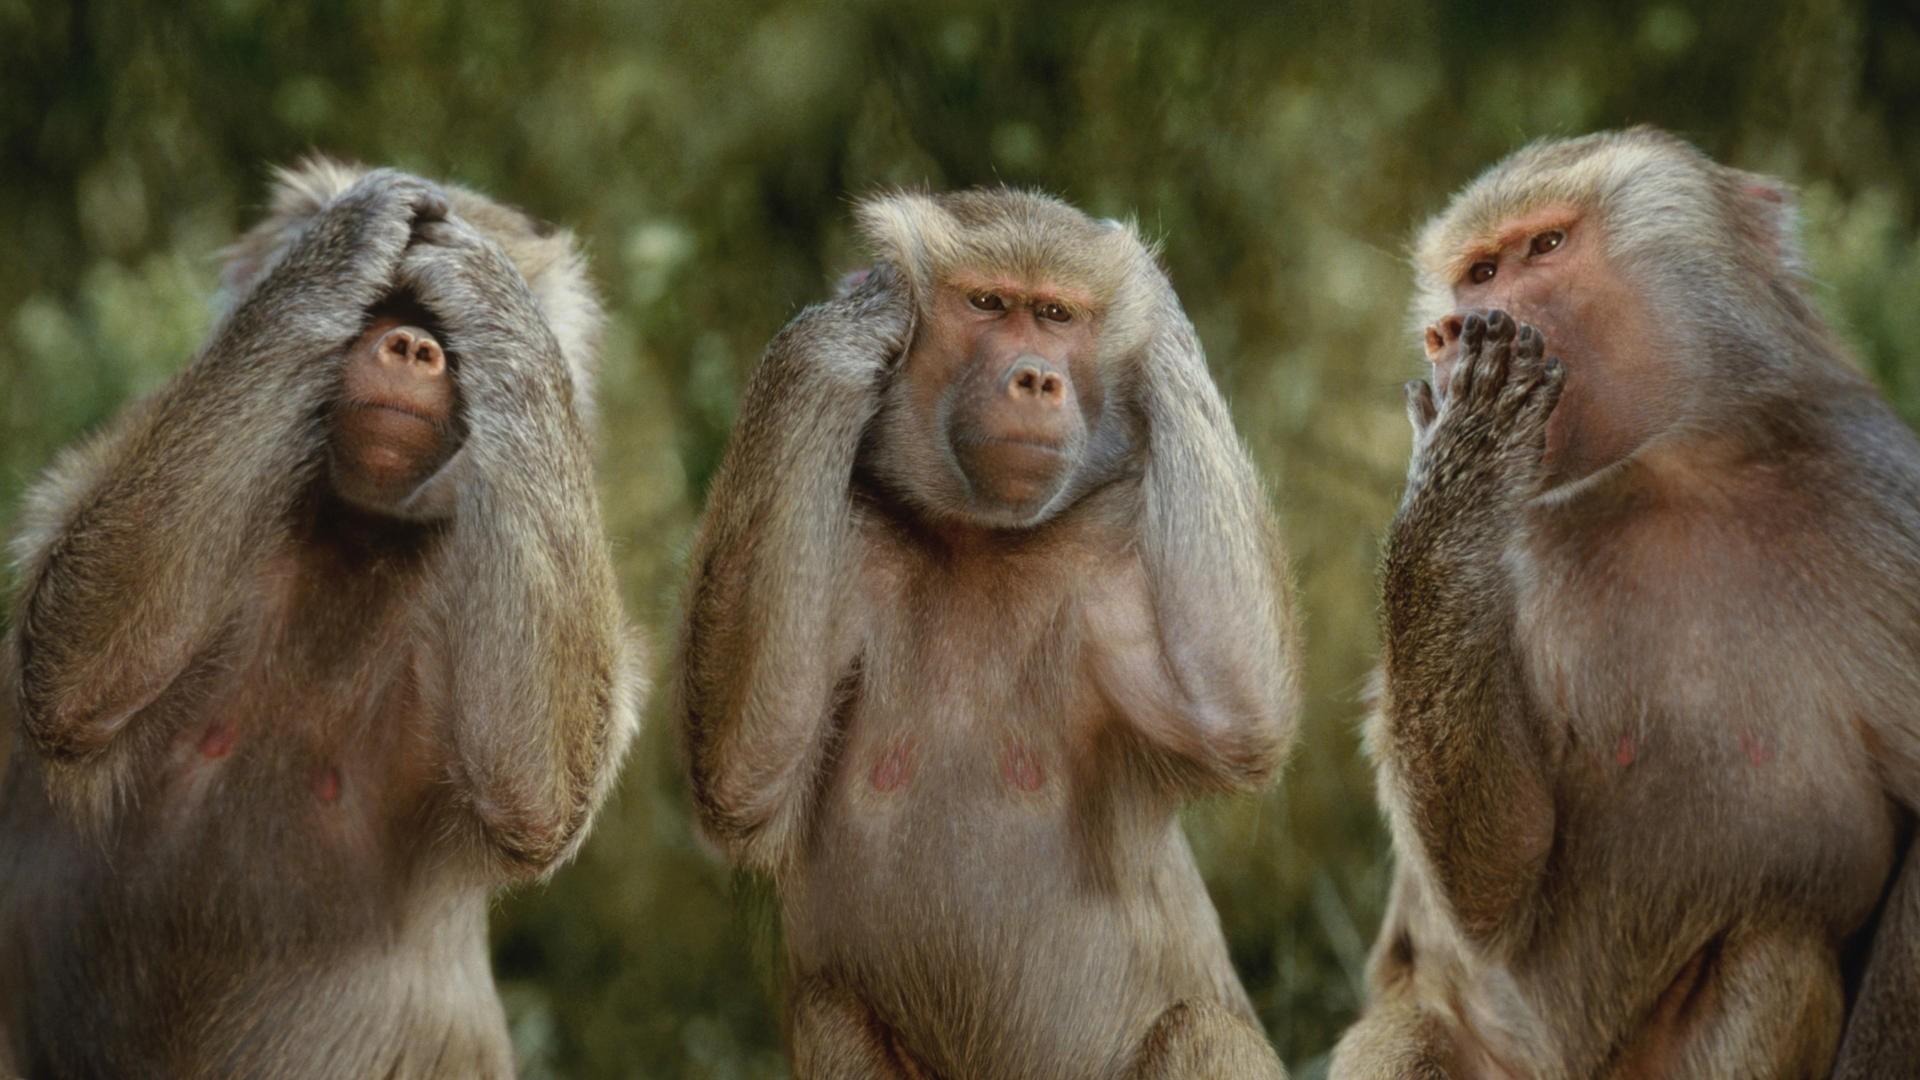 see no evil monkeys Wallpaper Background 3877 1920x1080